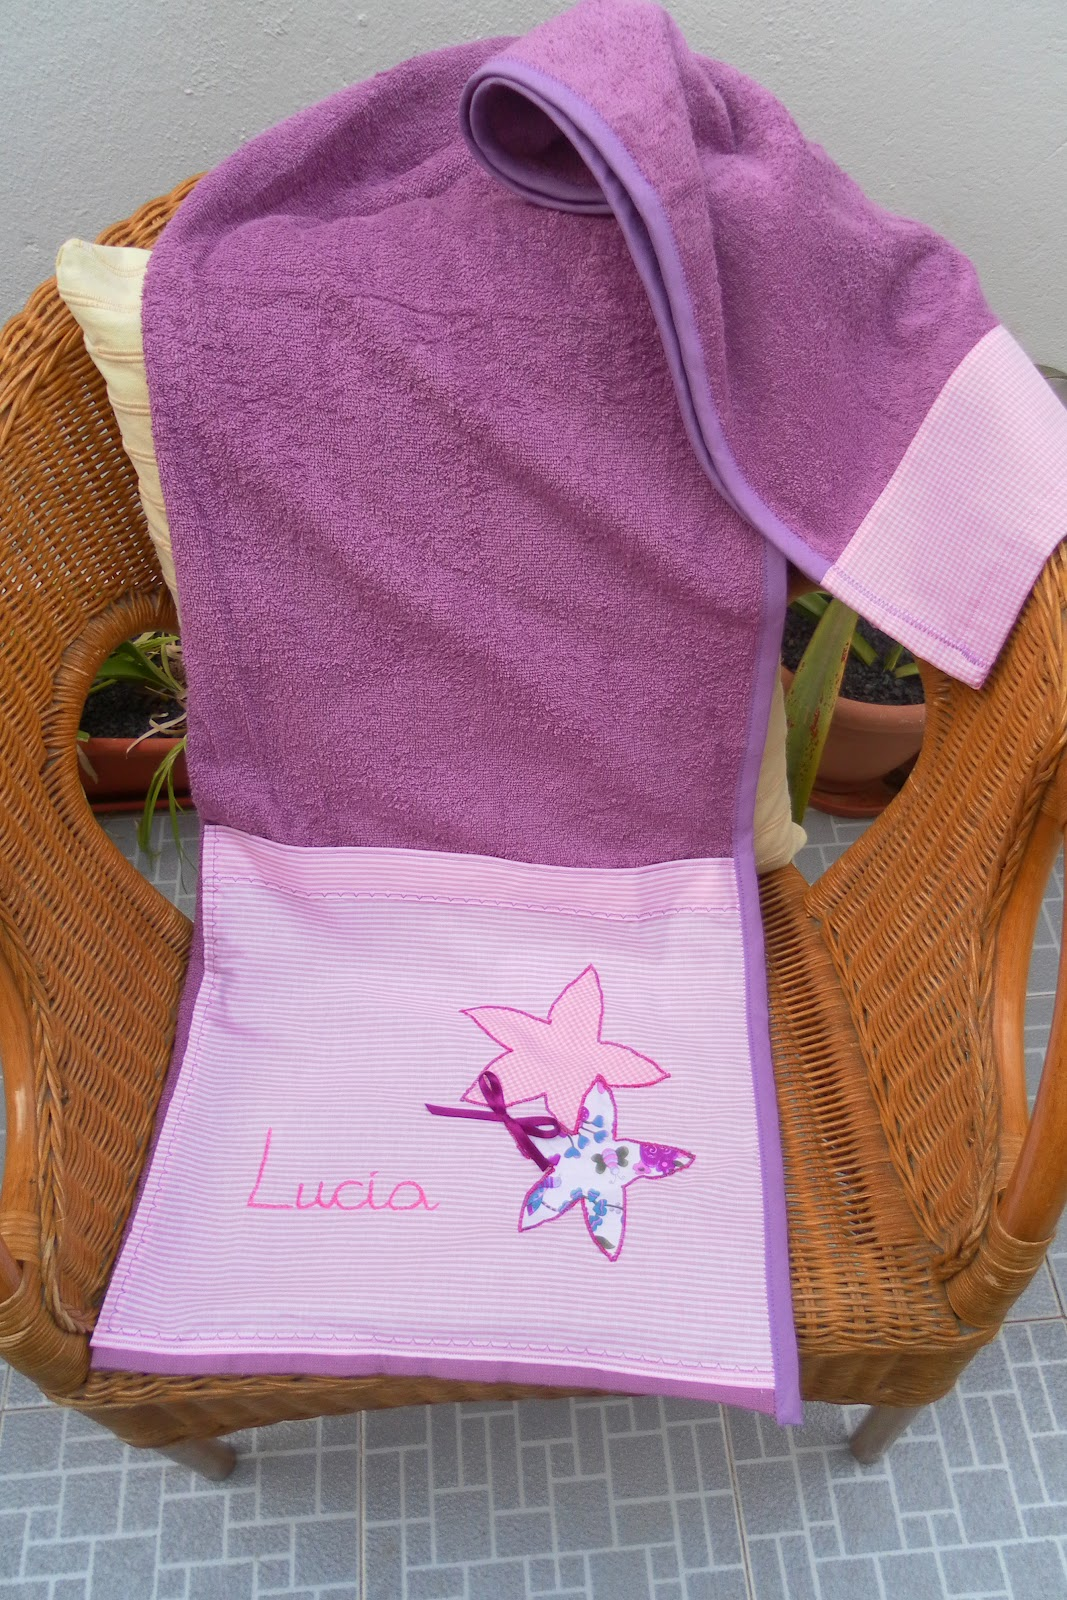 Toallas personalizadas para ni os imagui - Toallas infantiles personalizadas ...